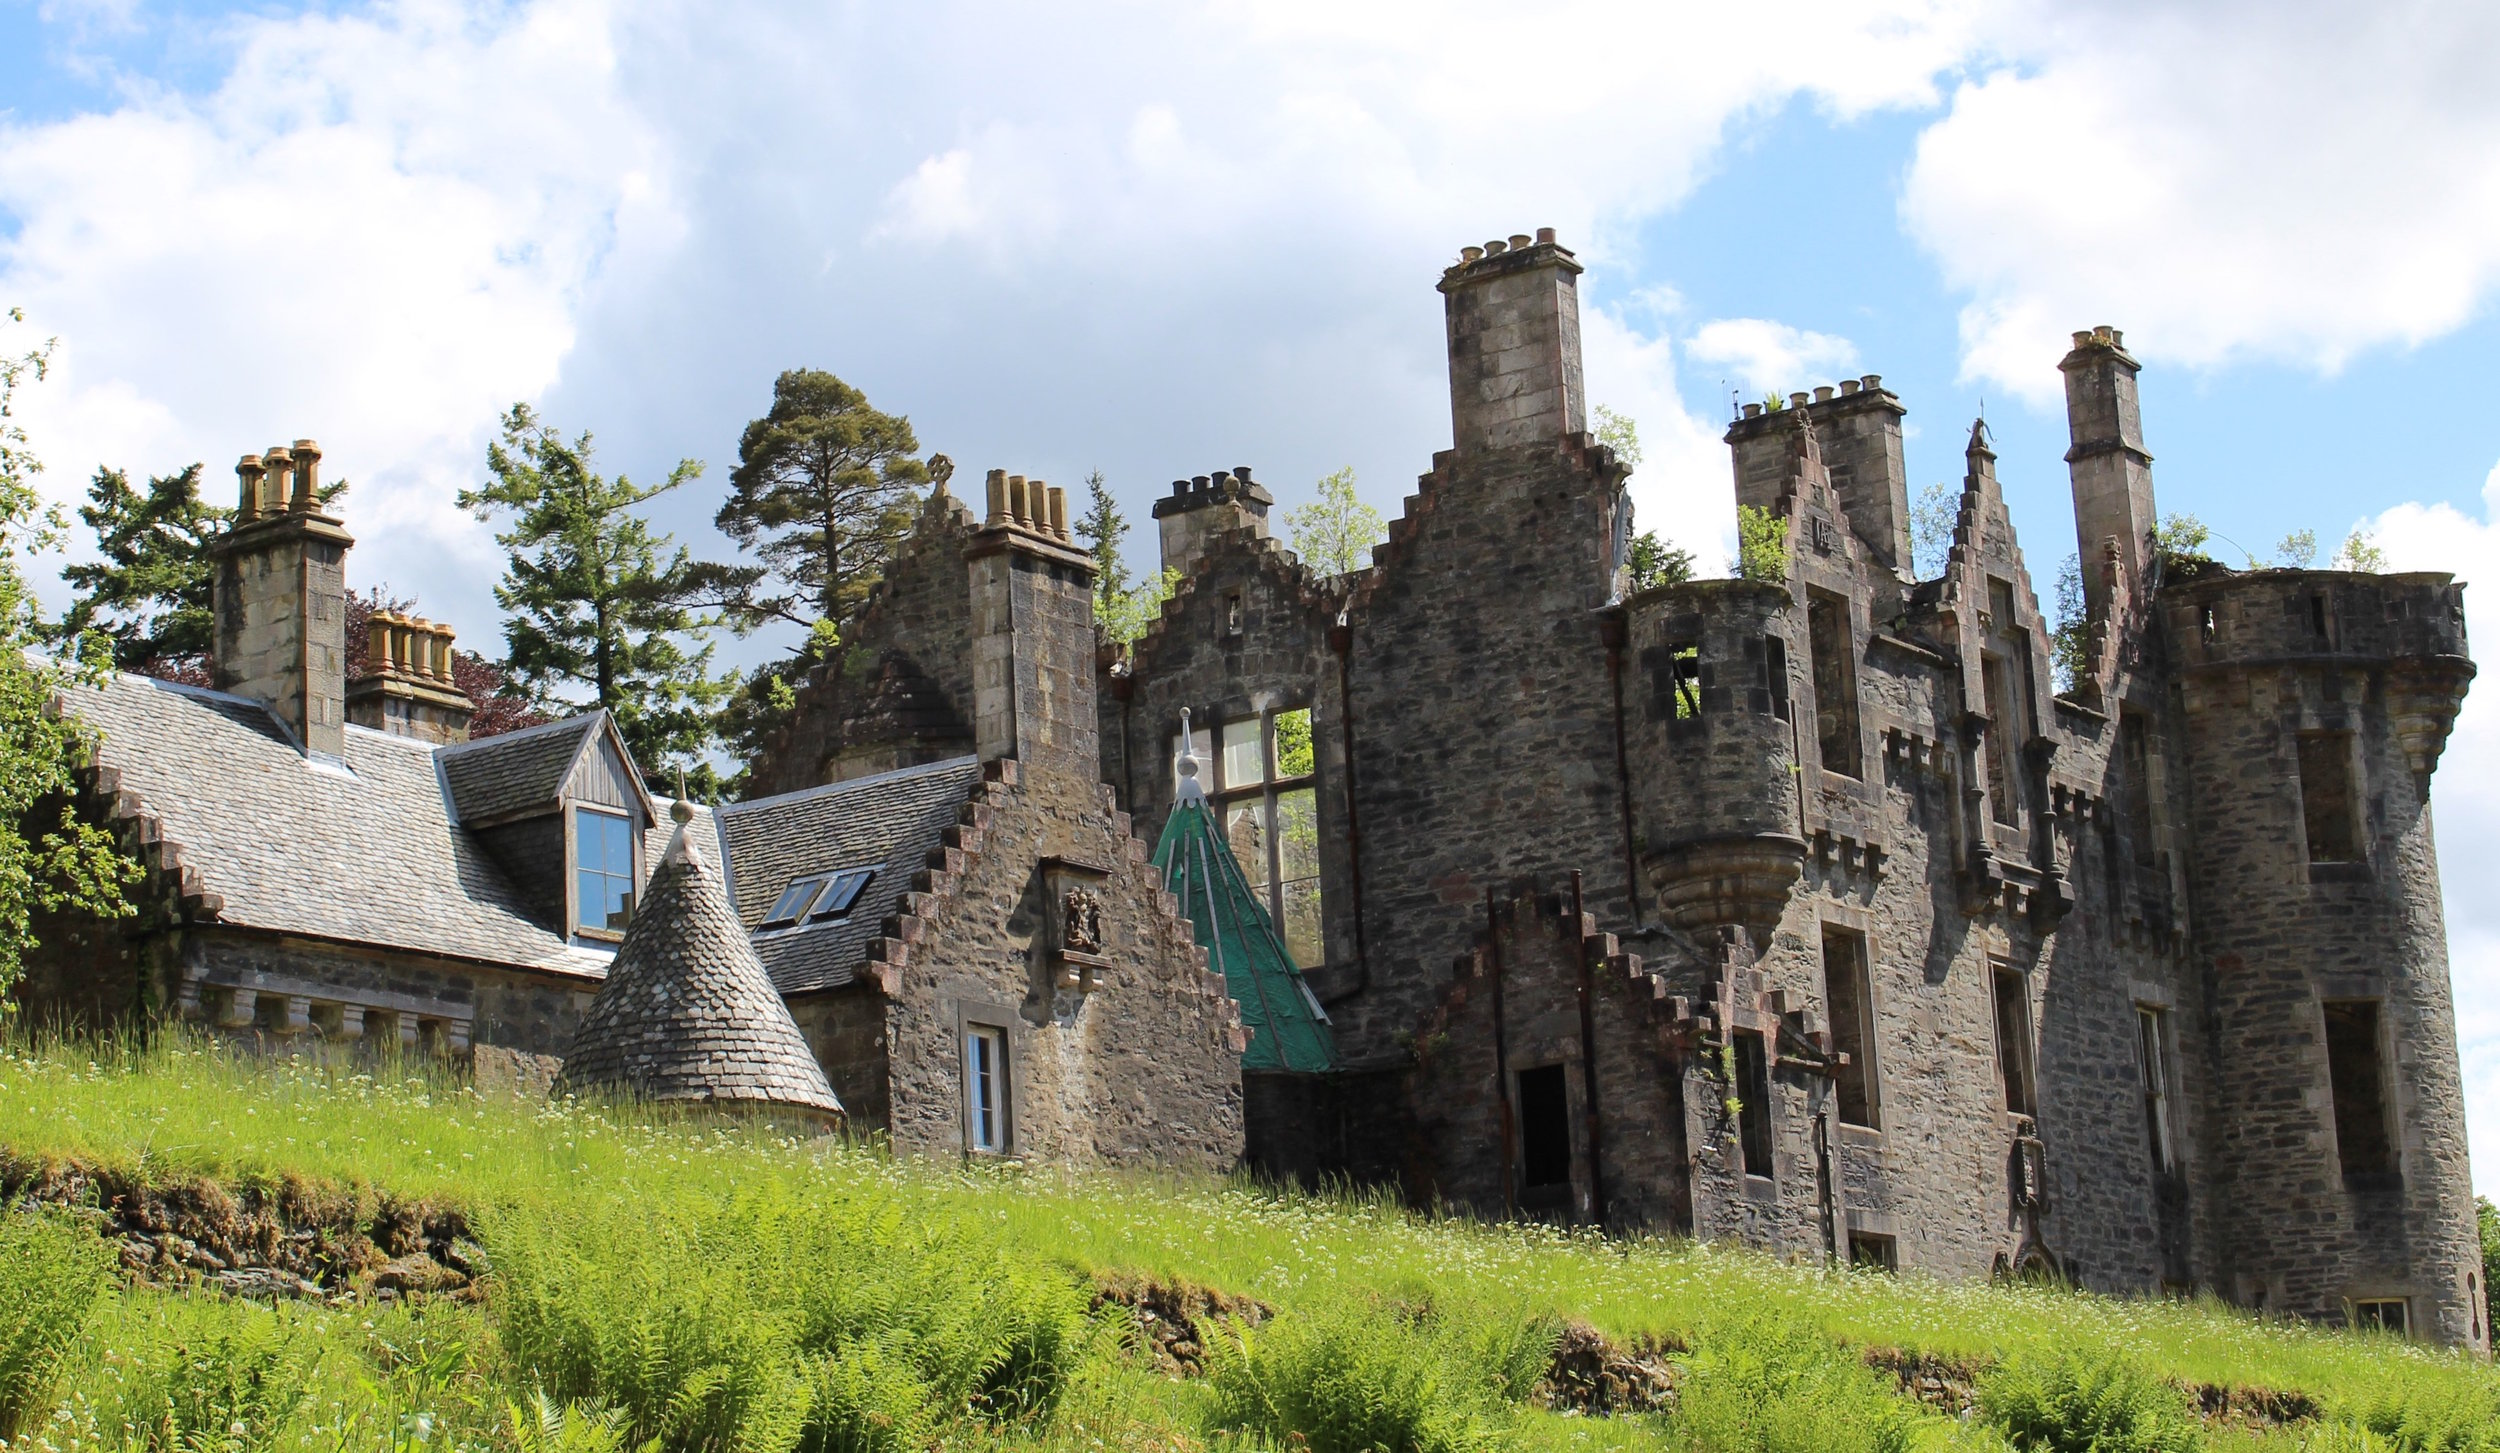 Dunans Castle ruin CDudk cropped.jpeg